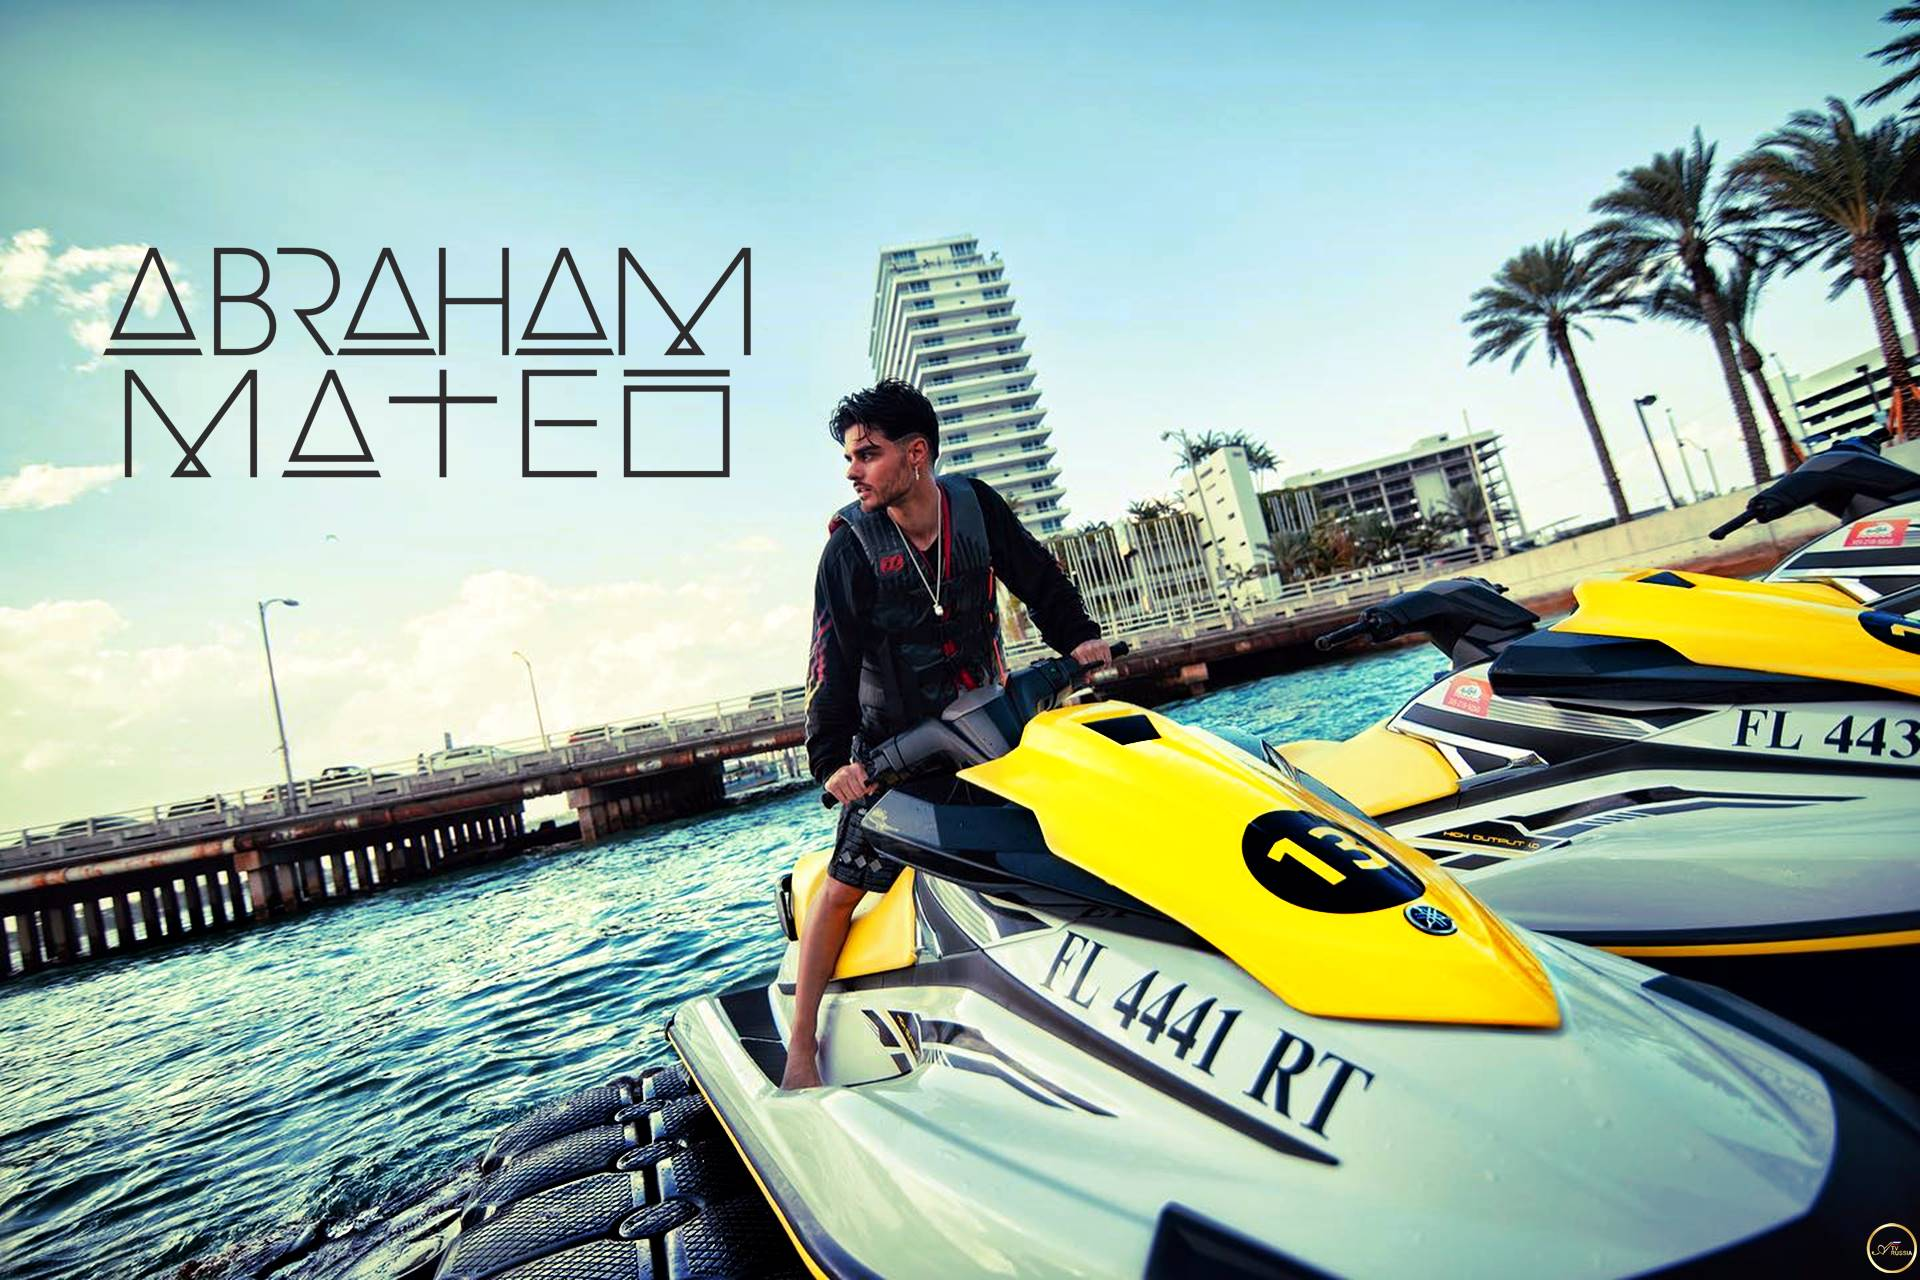 Abraham Mateo